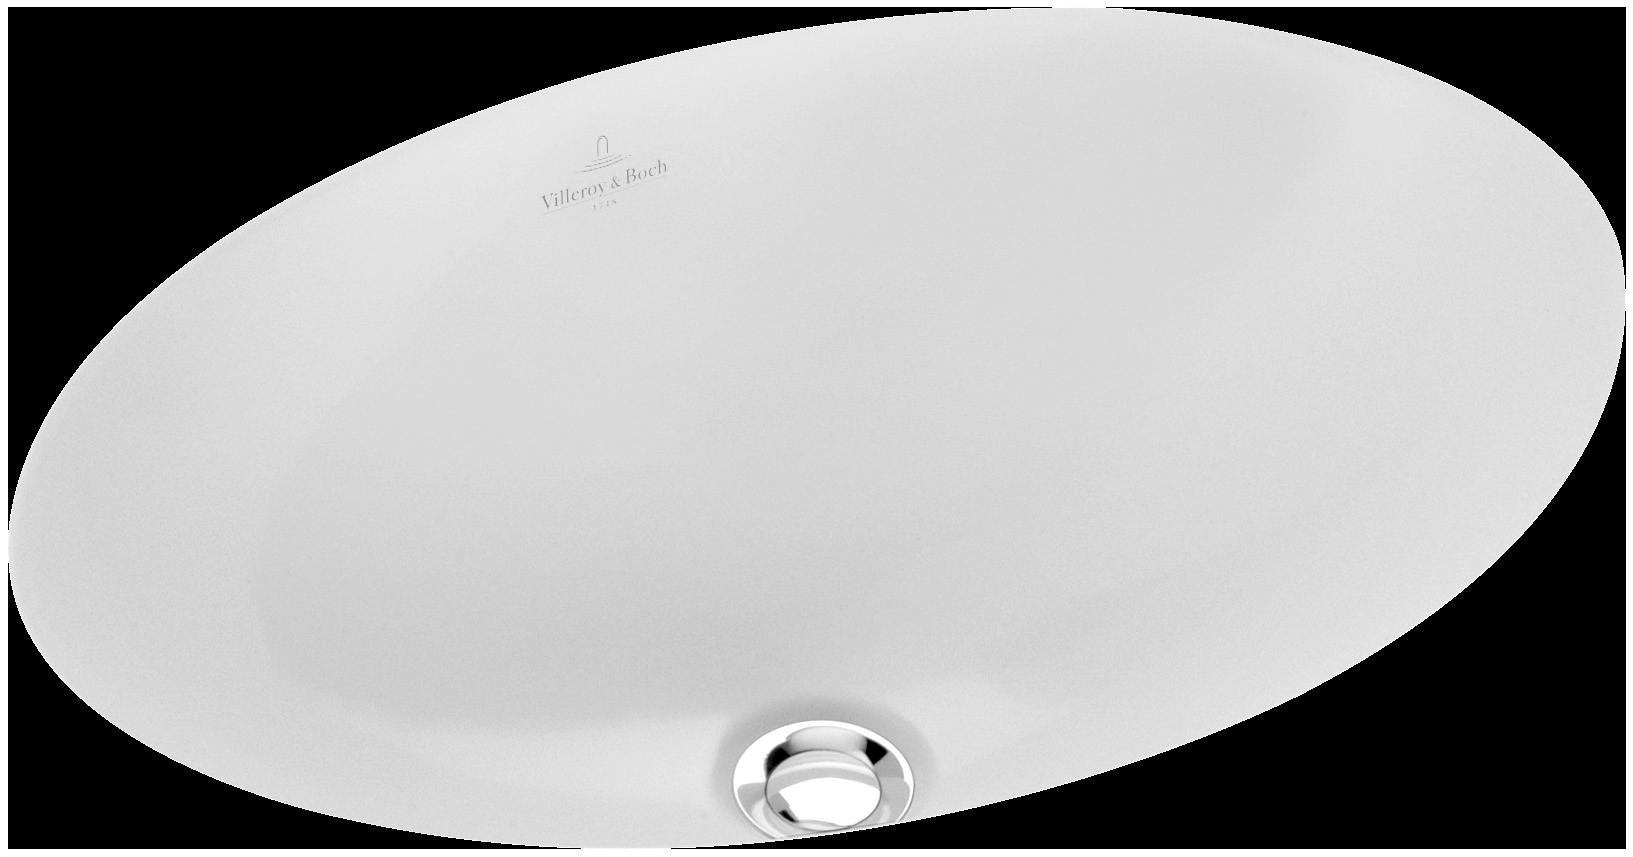 loop & friends undercounter washbasin (oval) oval 6161u3  villeroy